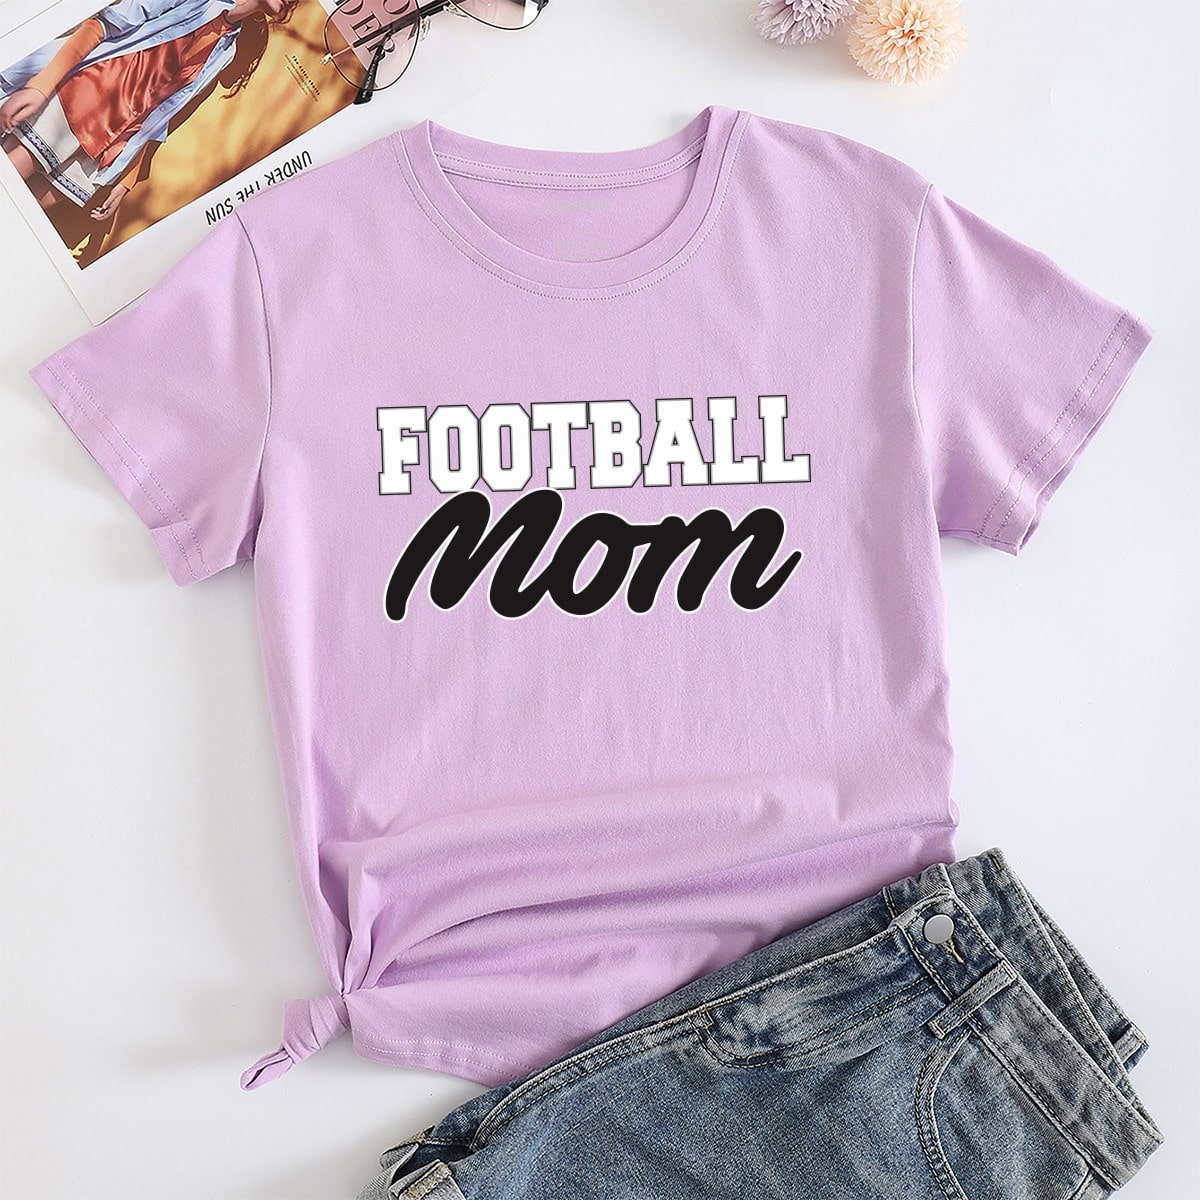 Casual Tekst T-shirt